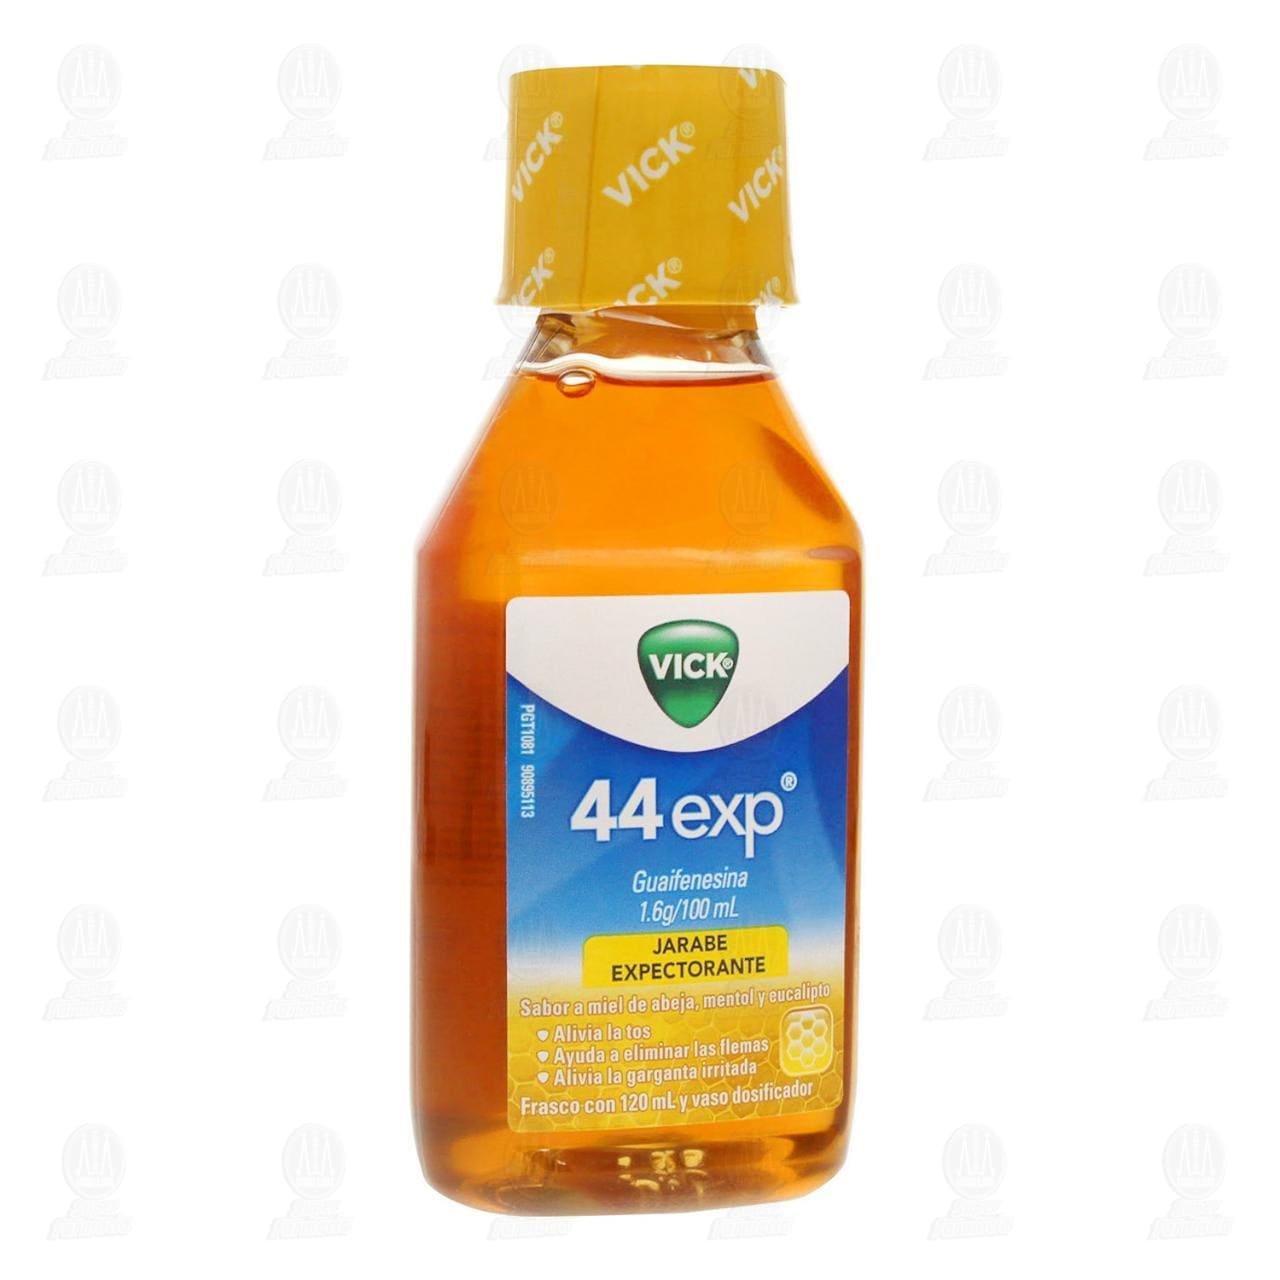 Comprar Vick 44 Exp Sabor a Miel de Abeja, Mentol y Eucalipto 120ml en Farmacias Guadalajara